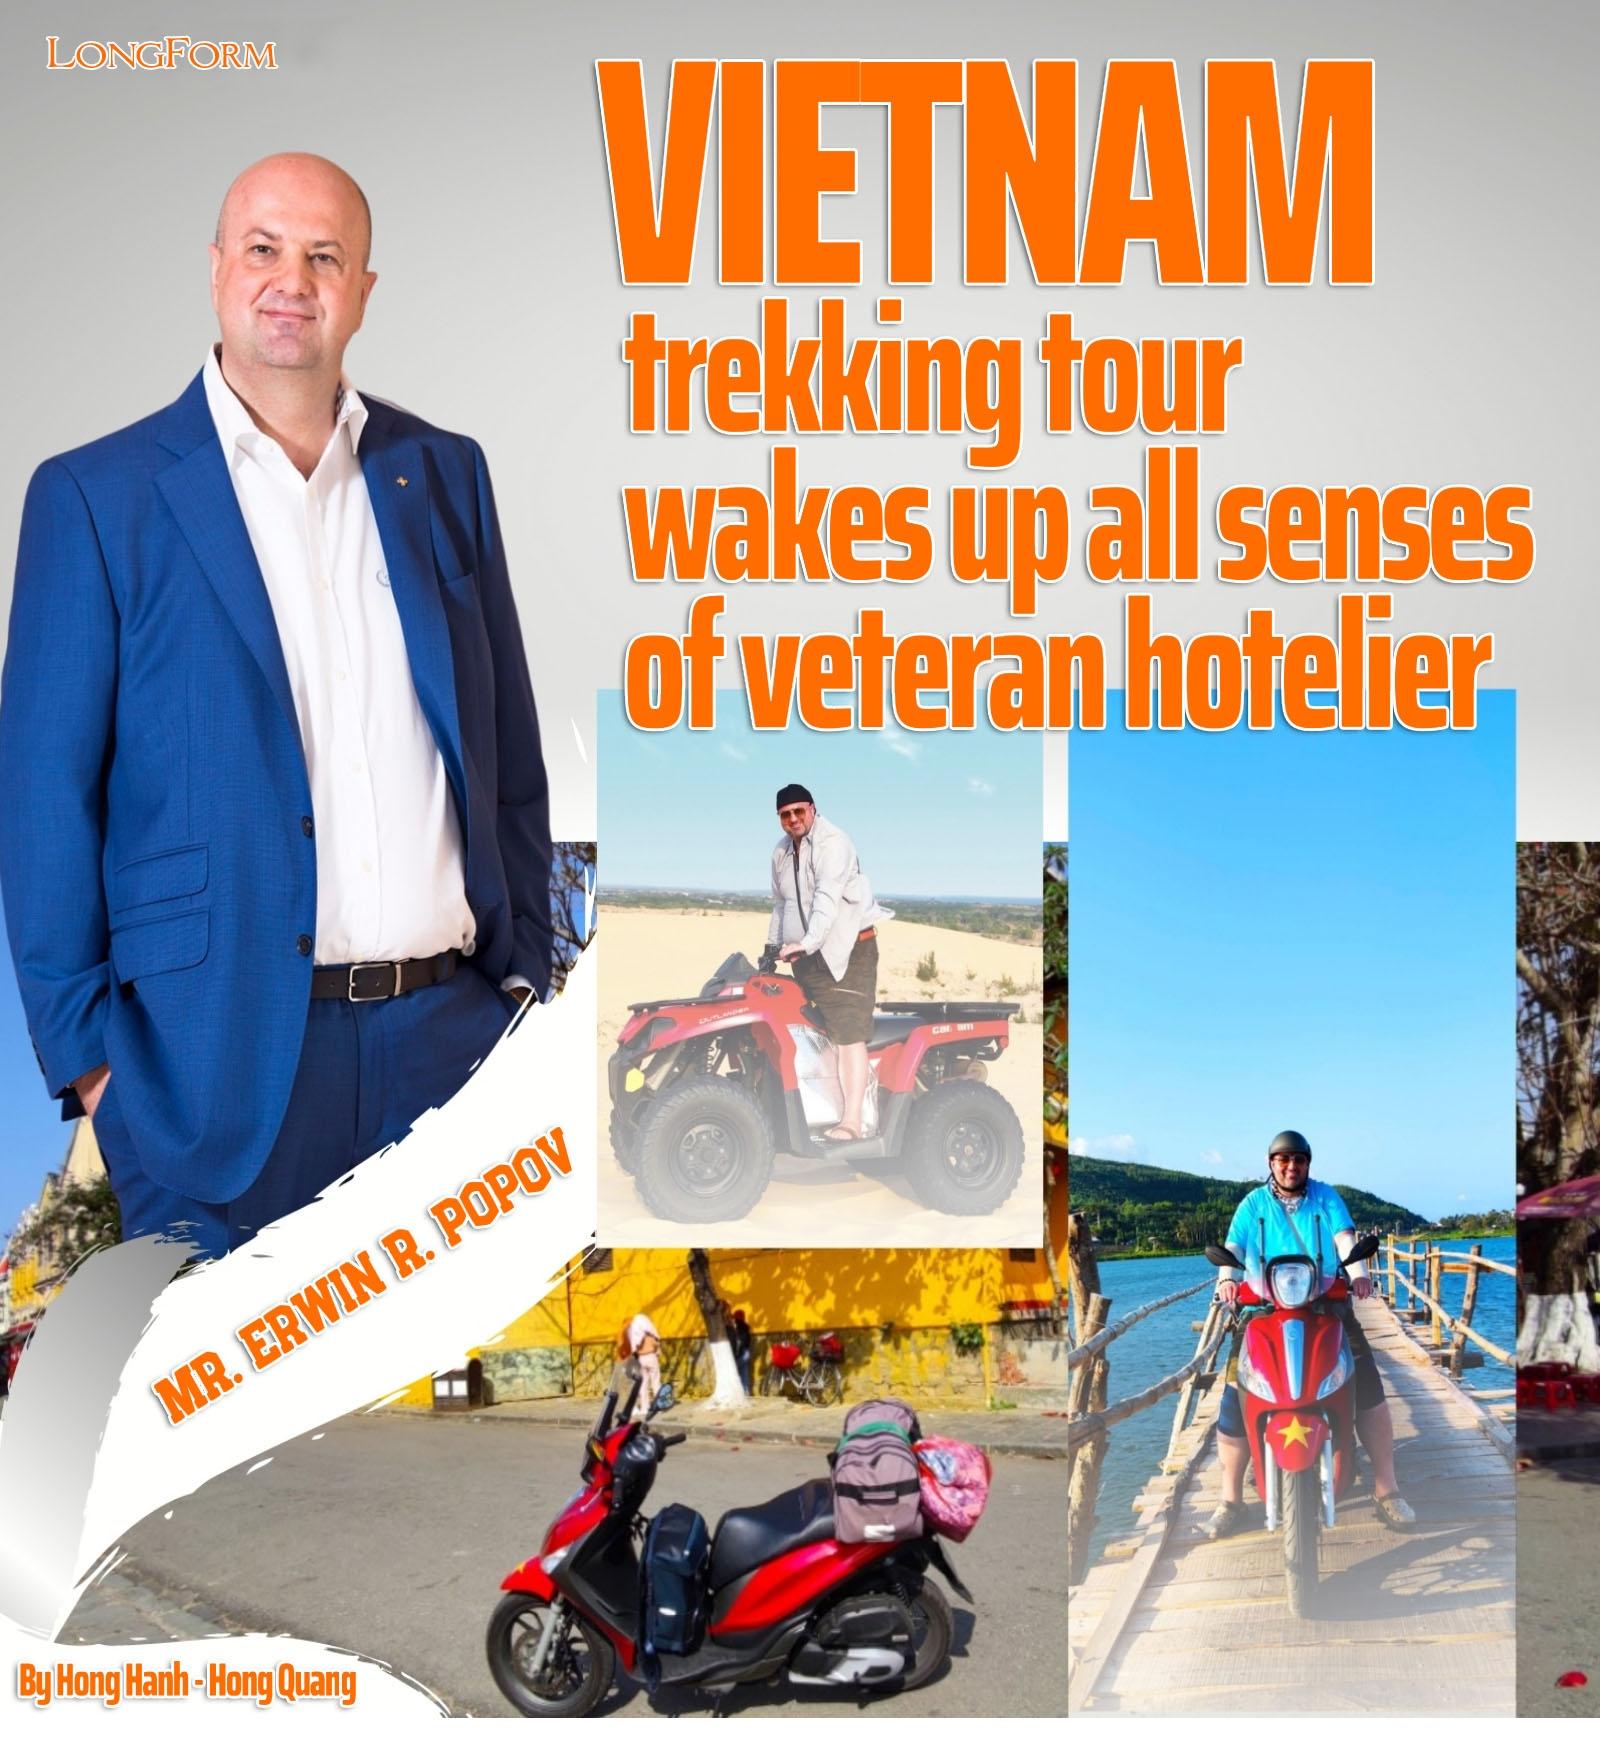 vietnam trekking tour wakes up all senses of veteran hotelier